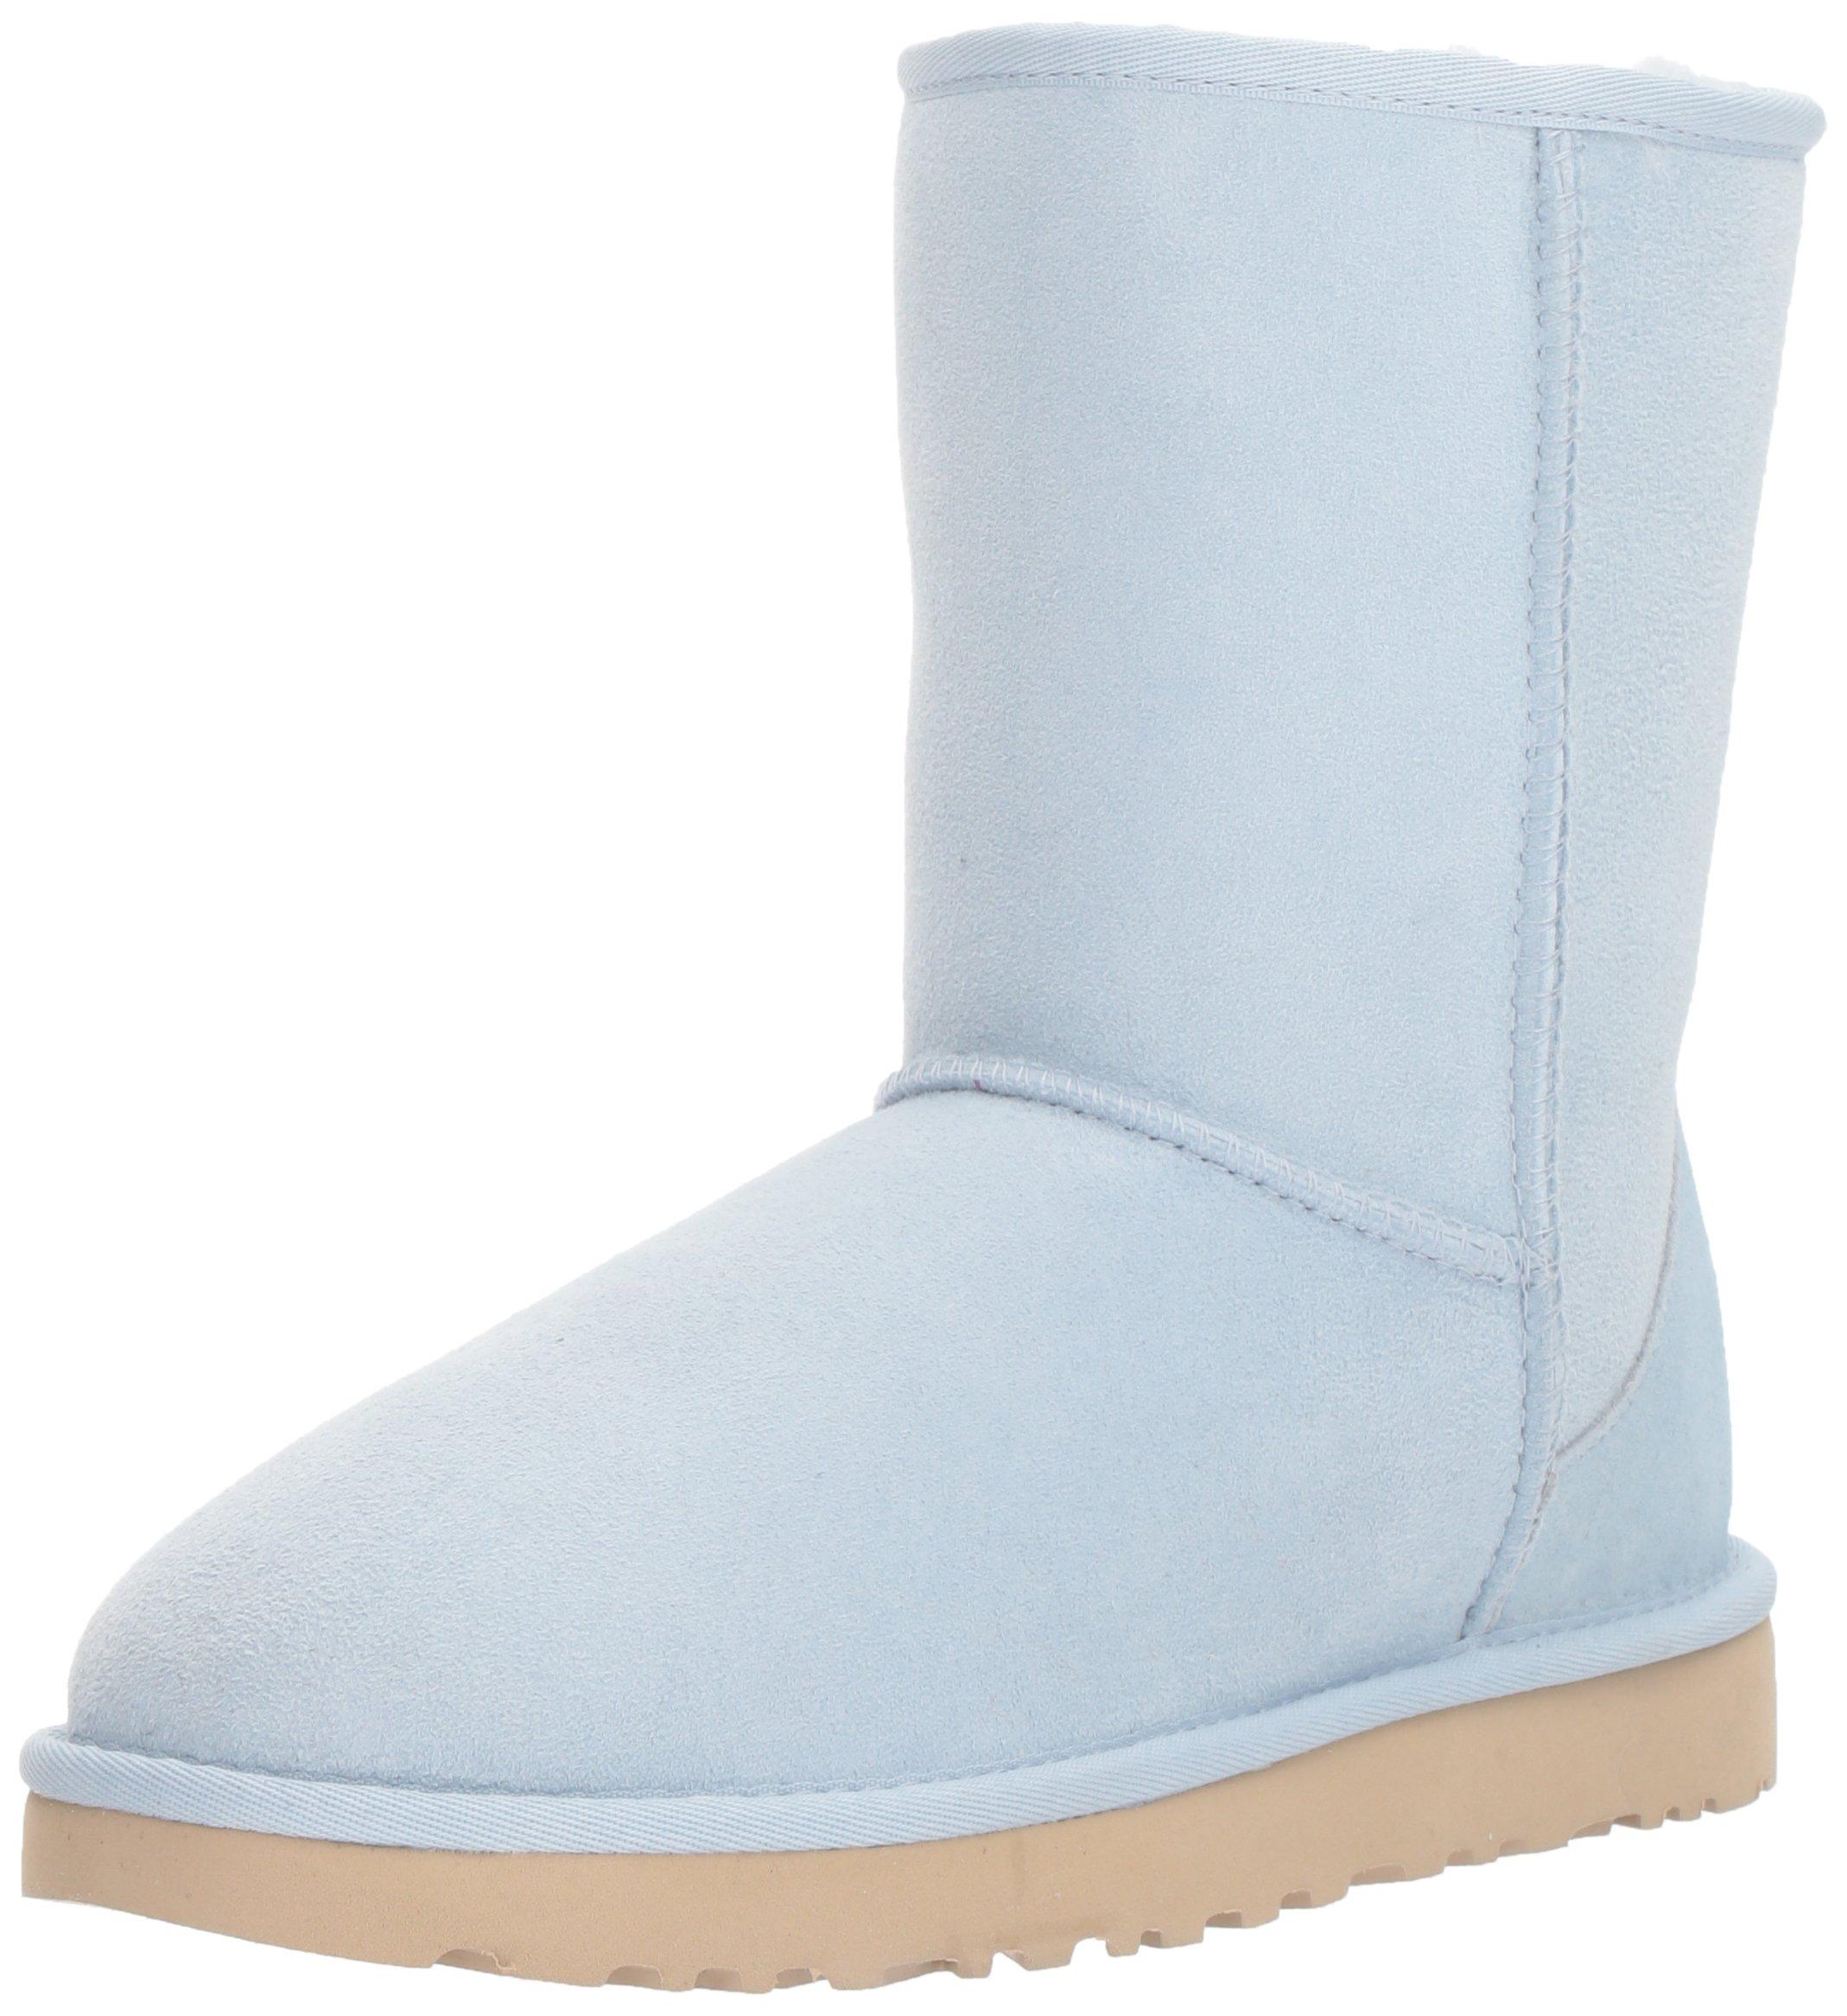 UGG Women's Classic Short II Fashion Boot, Sky Blue, 10 M US